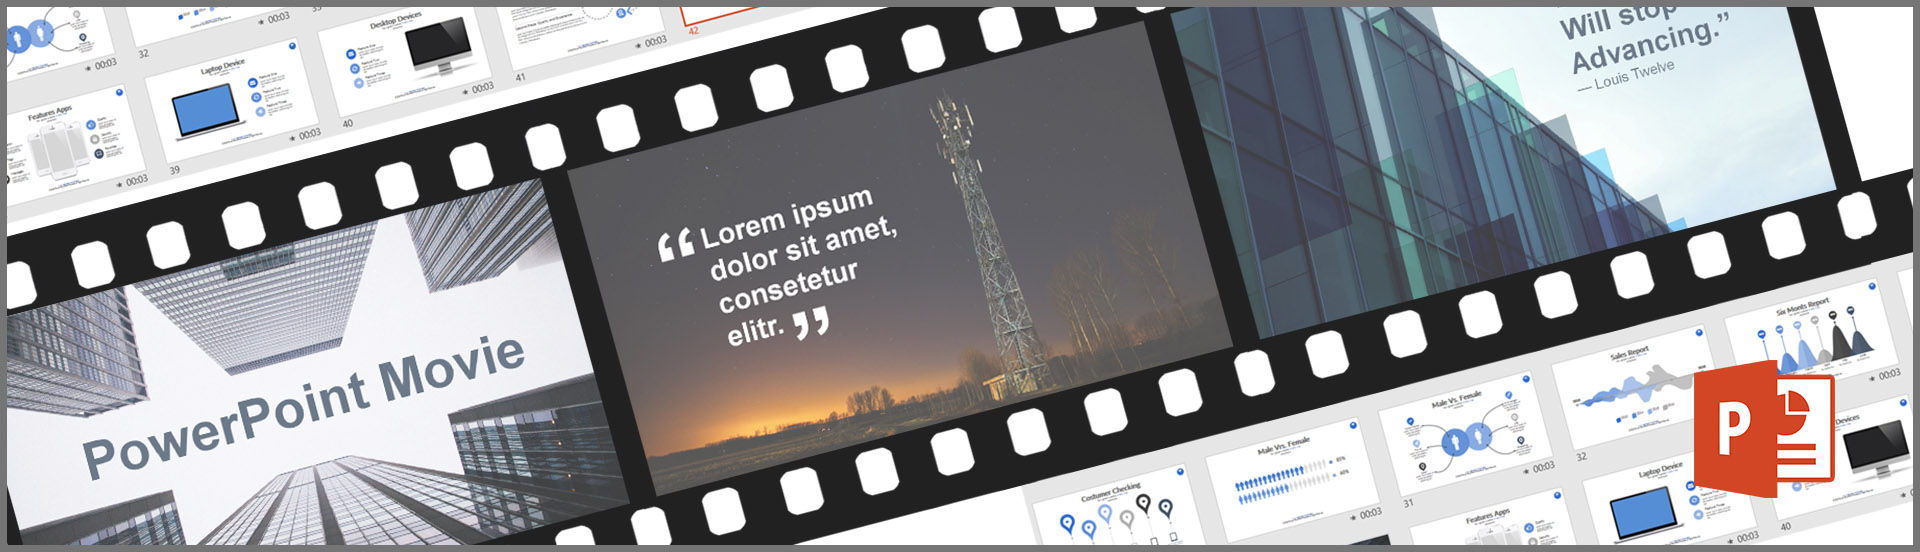 ppt_movies_1